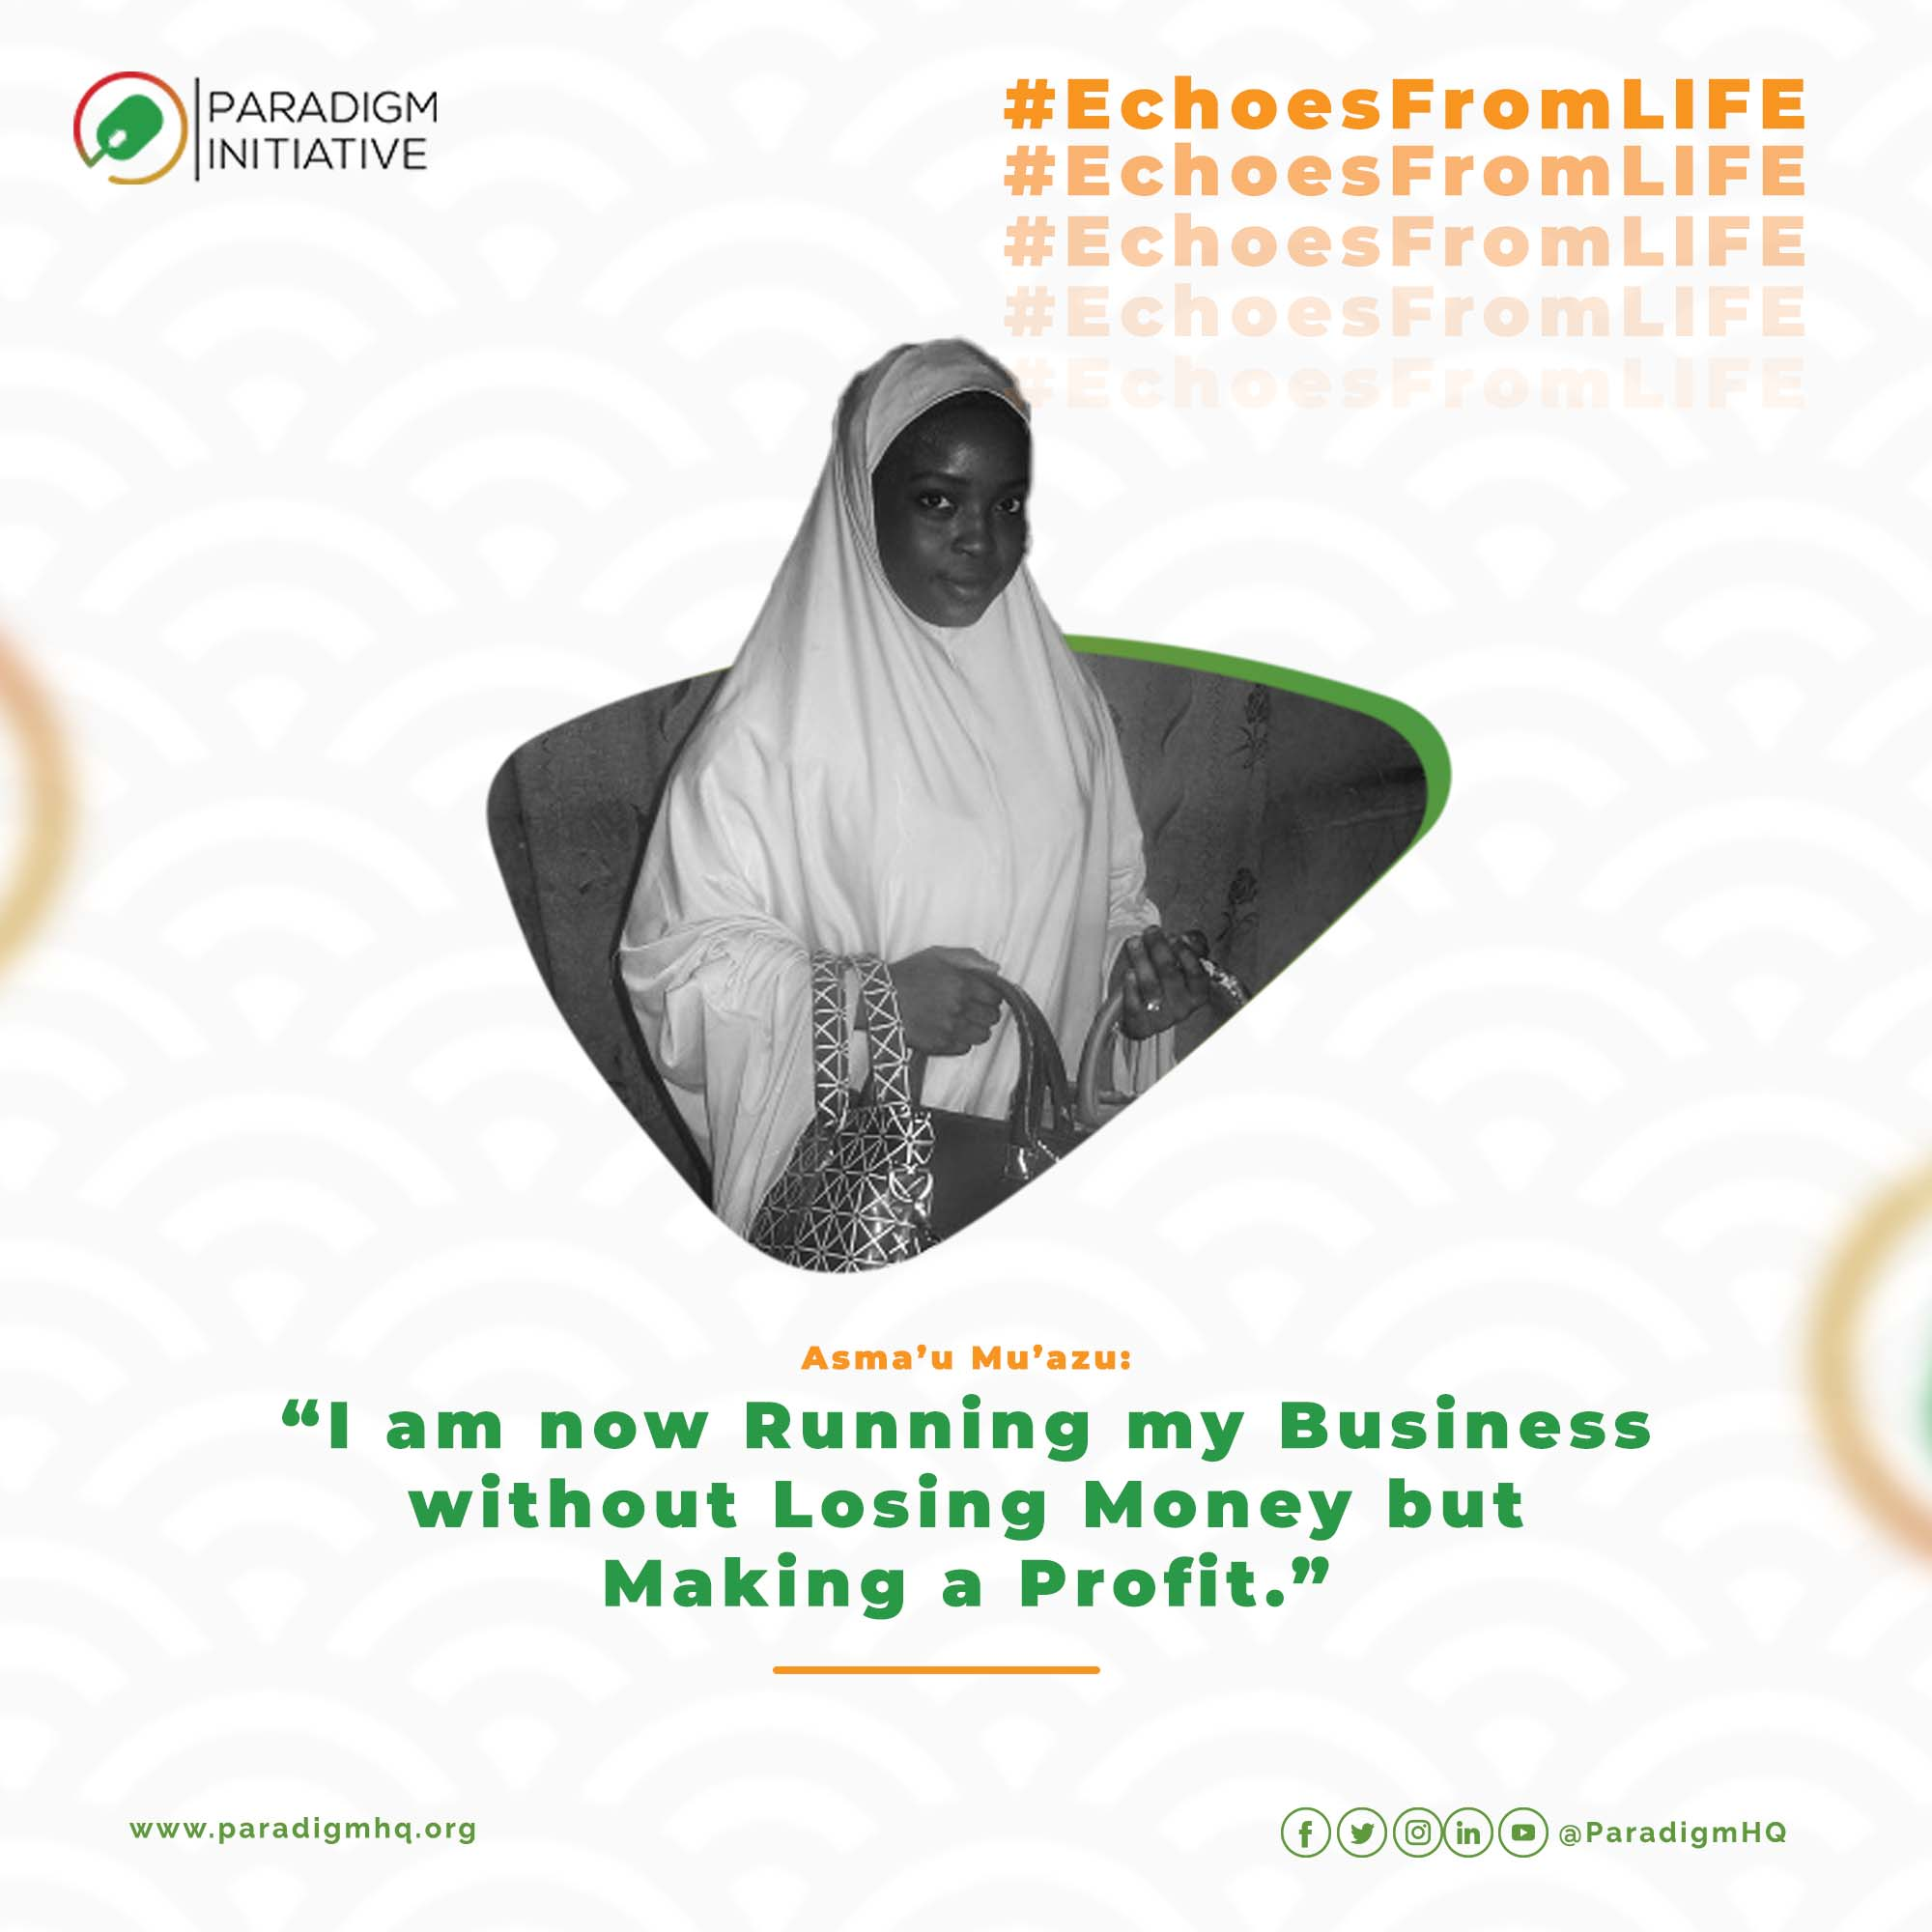 Asma'u Mu'azu: I am now Running my Business without Losing Money but Making a Profit.